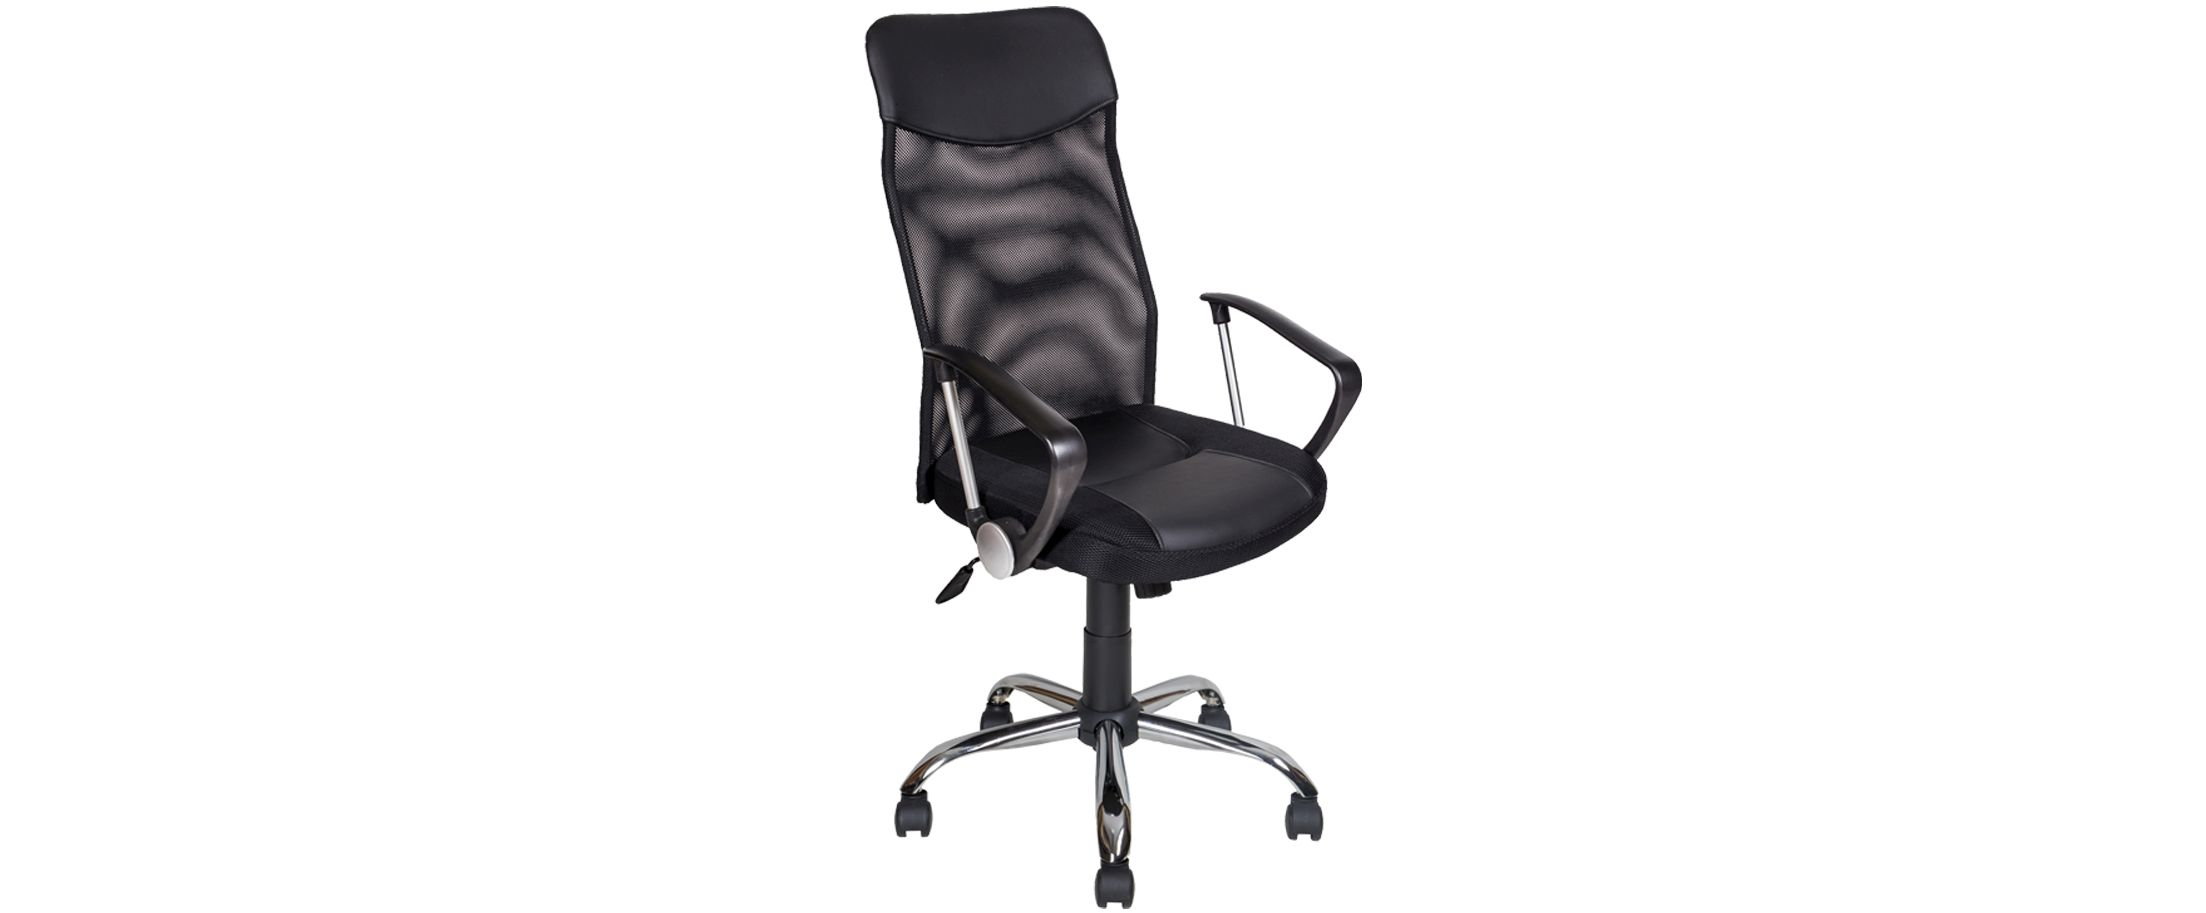 Кресло офисное AV 128 цвет черный Модель 999Кресло офисное AV 128 цвет черный Модель 999. Артикул Д000713<br>